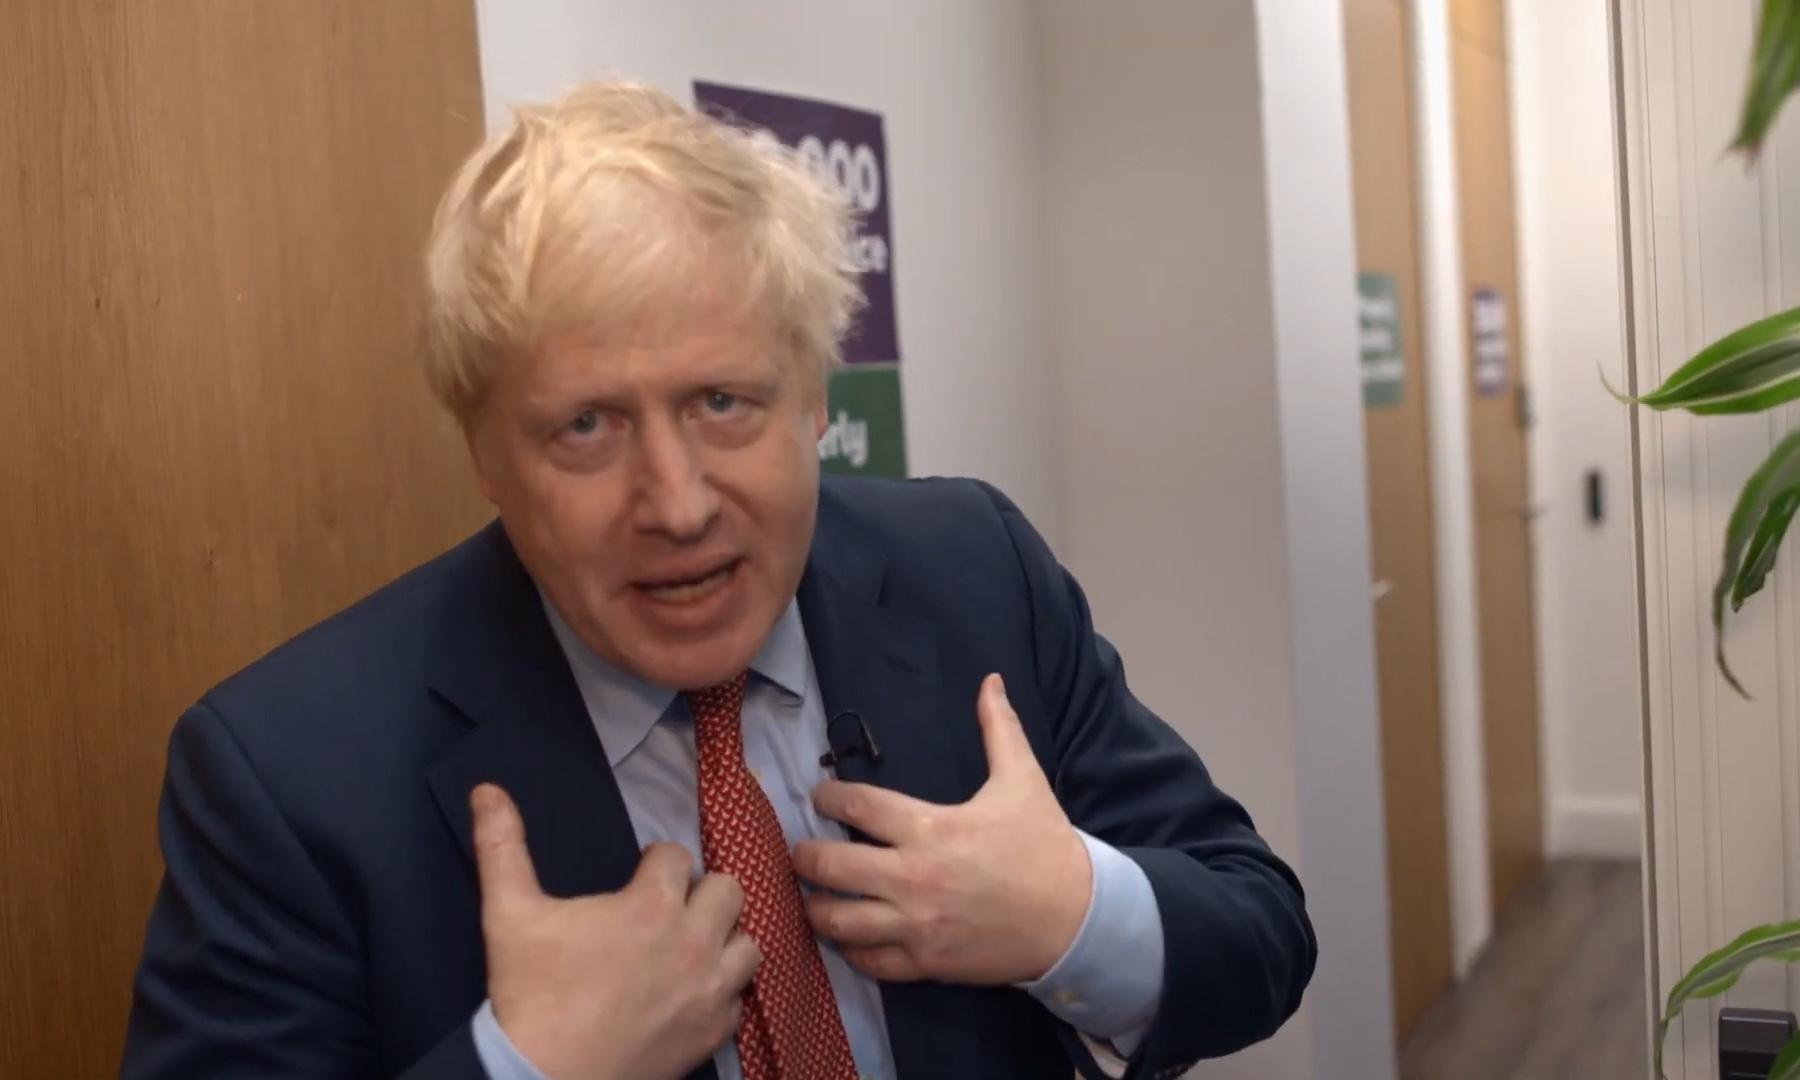 Boris Johnson's Vogue-style campaign video sparks comparisons with David Brent